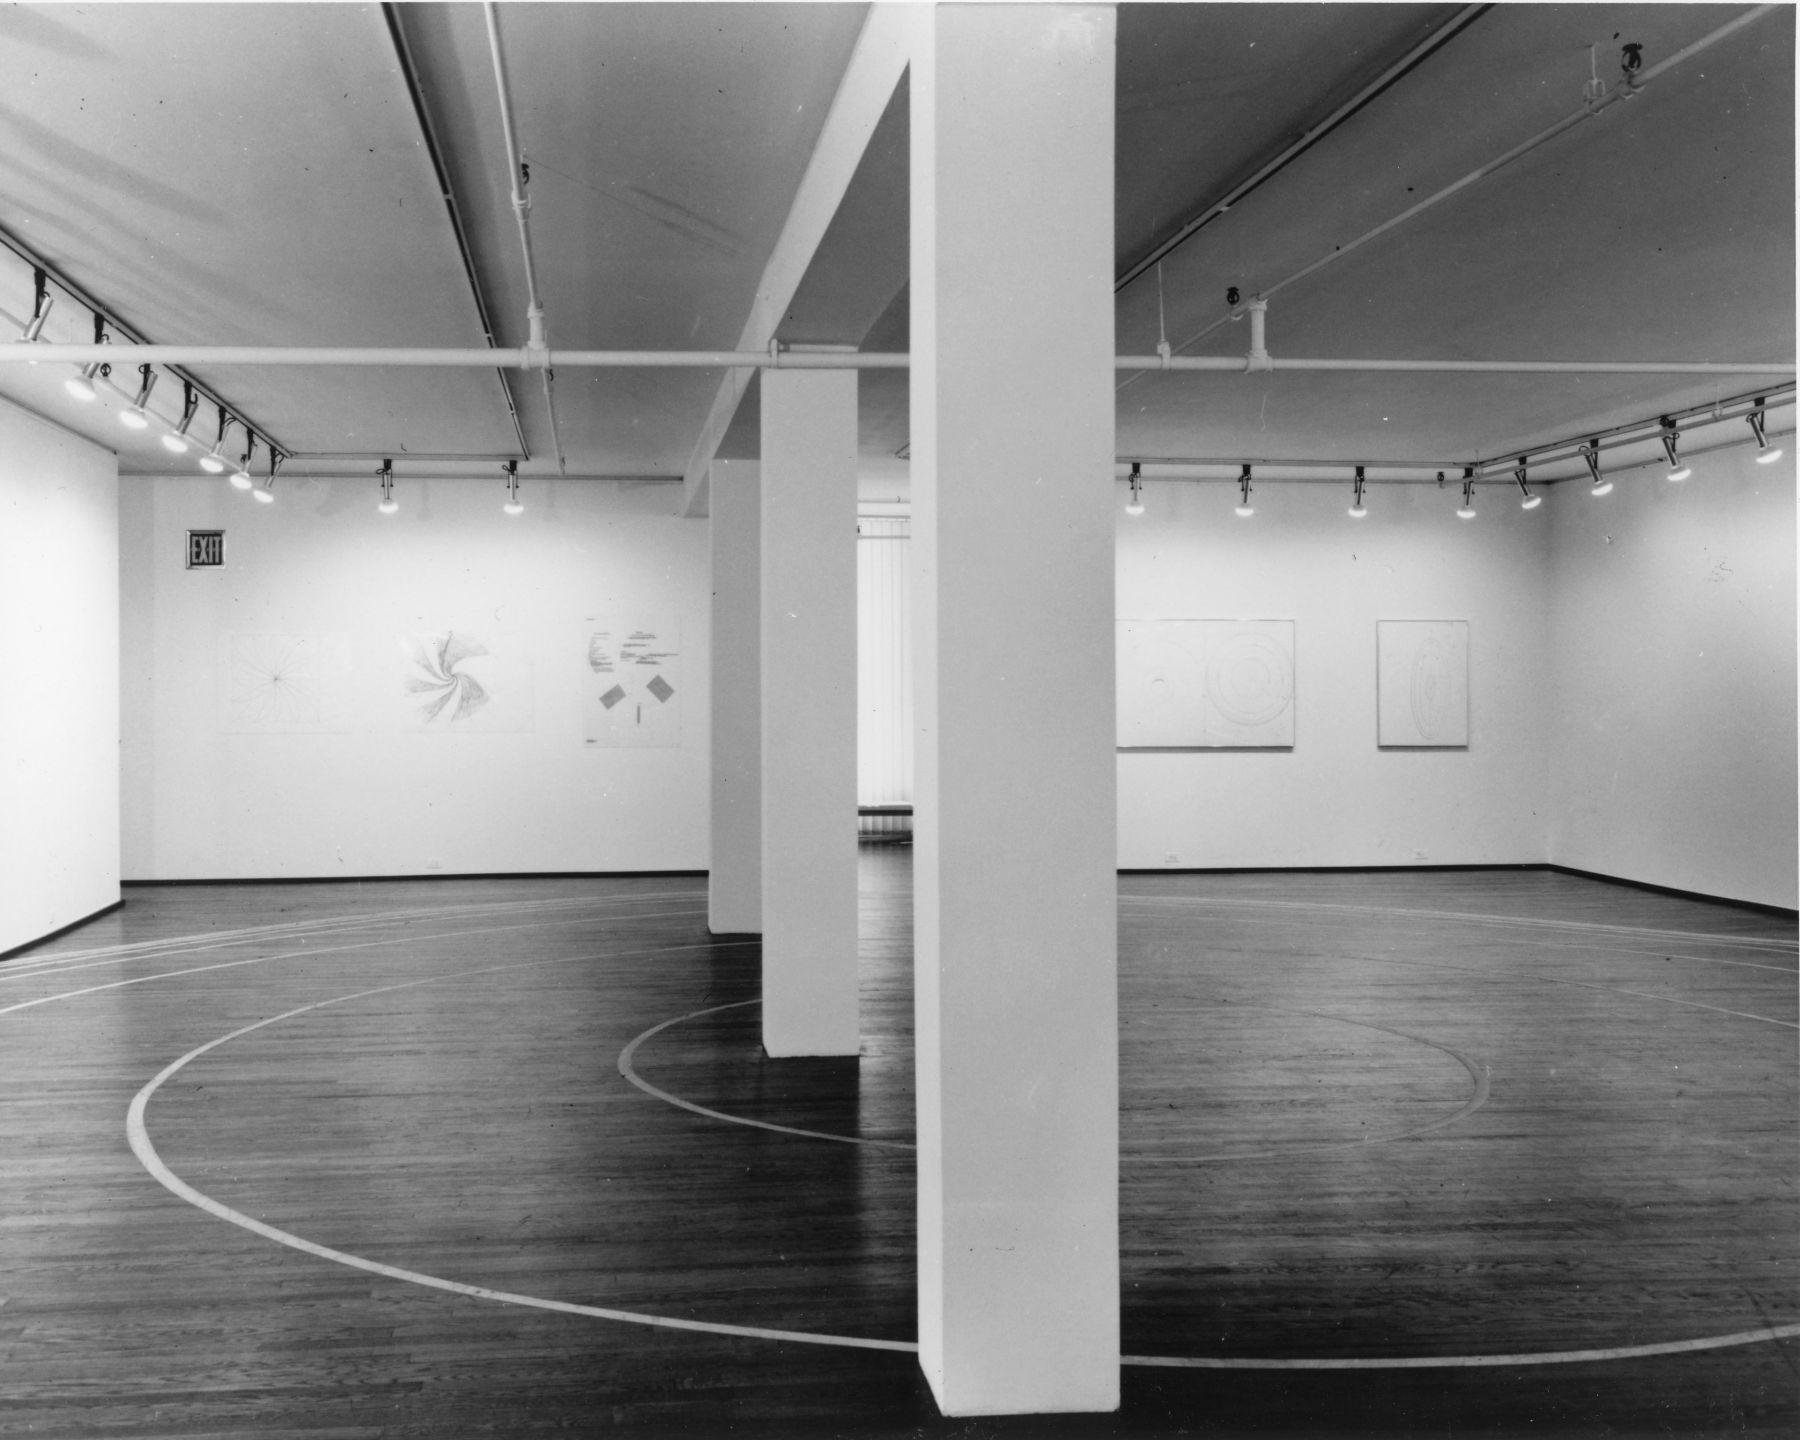 Installation view, Bruce Nauman: Cones / Cojones, 420 WEST BROADWAY